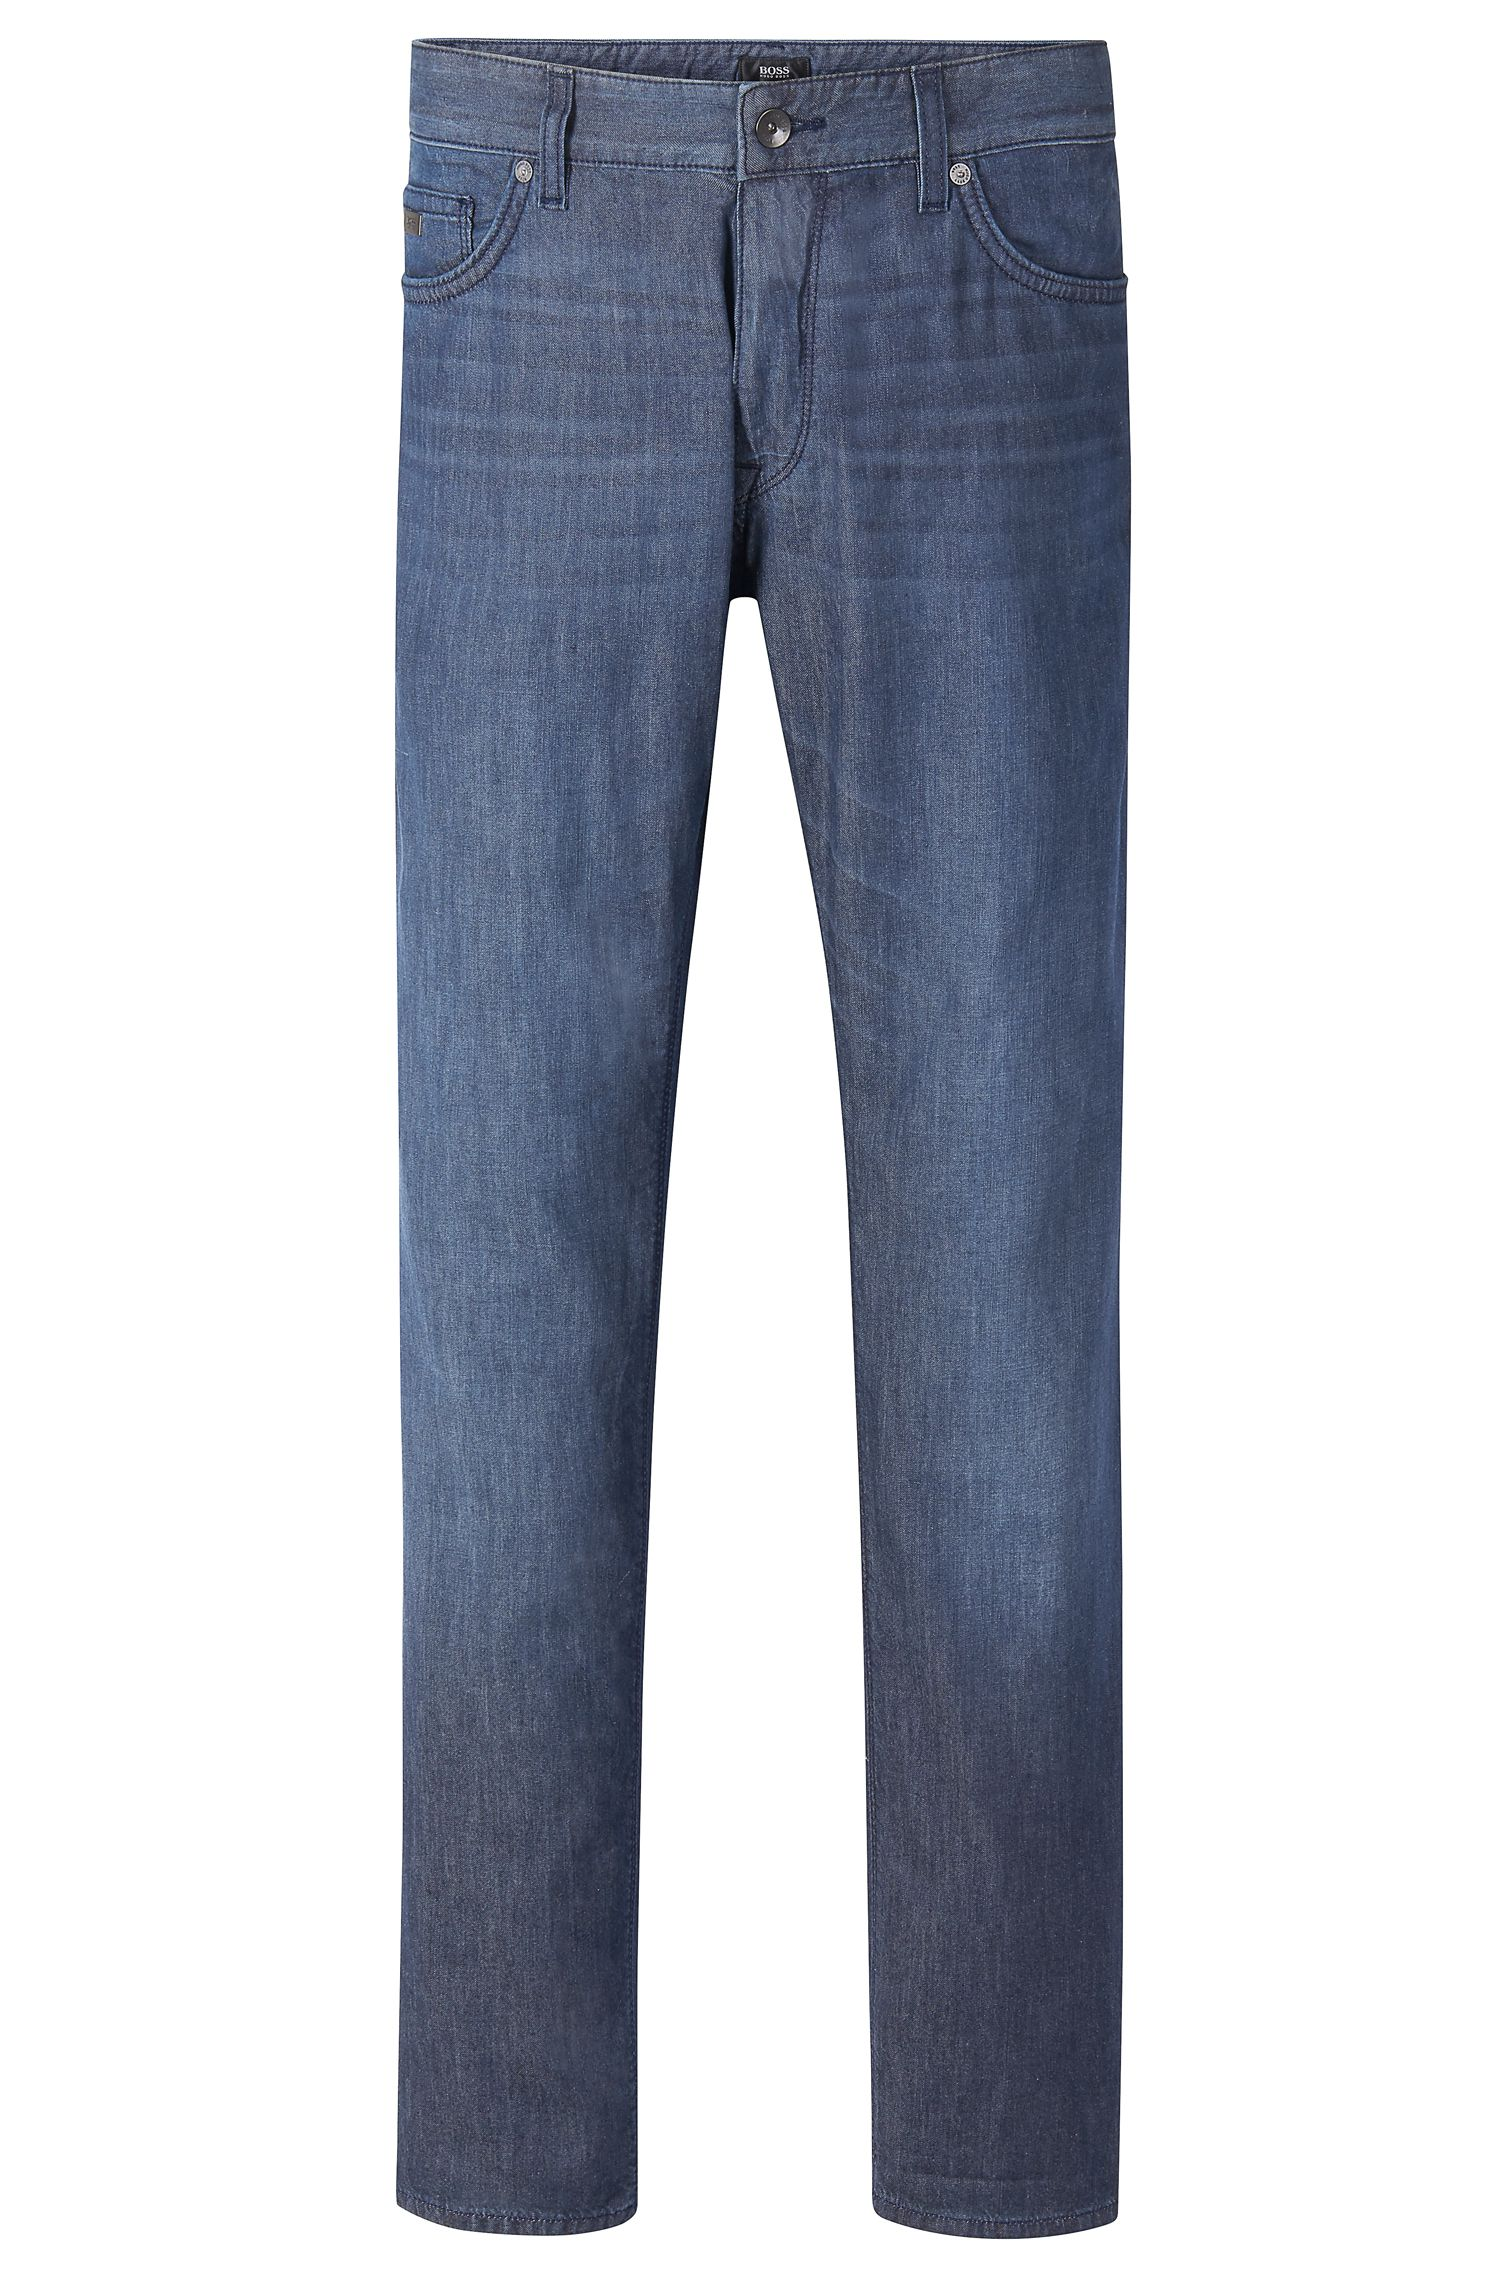 'Maine'   Regular Fit, 6 oz Stretch Cotton Jeans